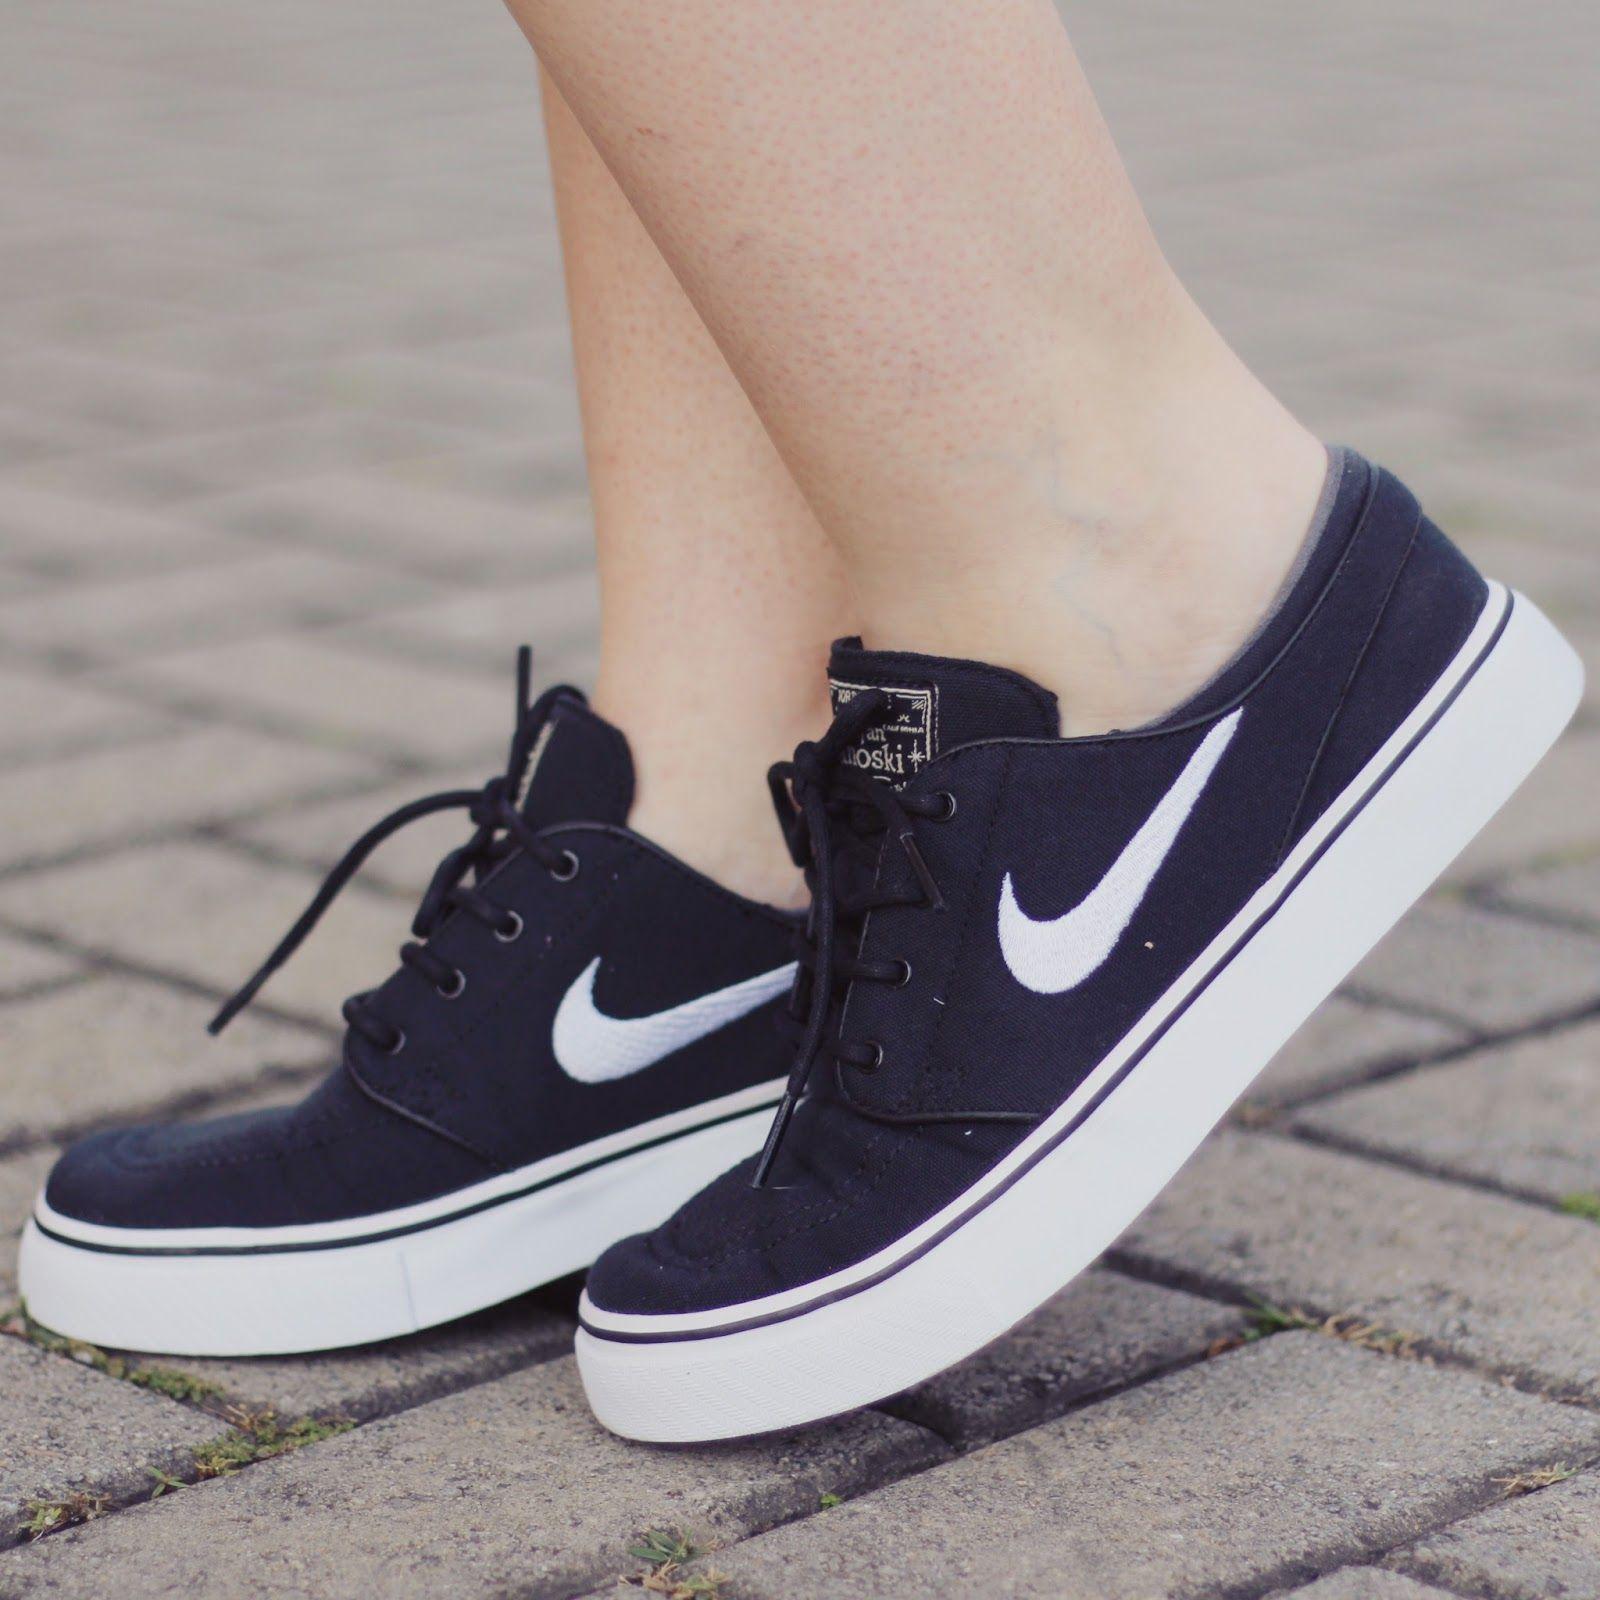 Výsledok vyhľadávania obrázkov pre dopyt nike tumblr shoes Converse Tumblr,  Vans, Adidas, Nike 26d7b2c8e1c